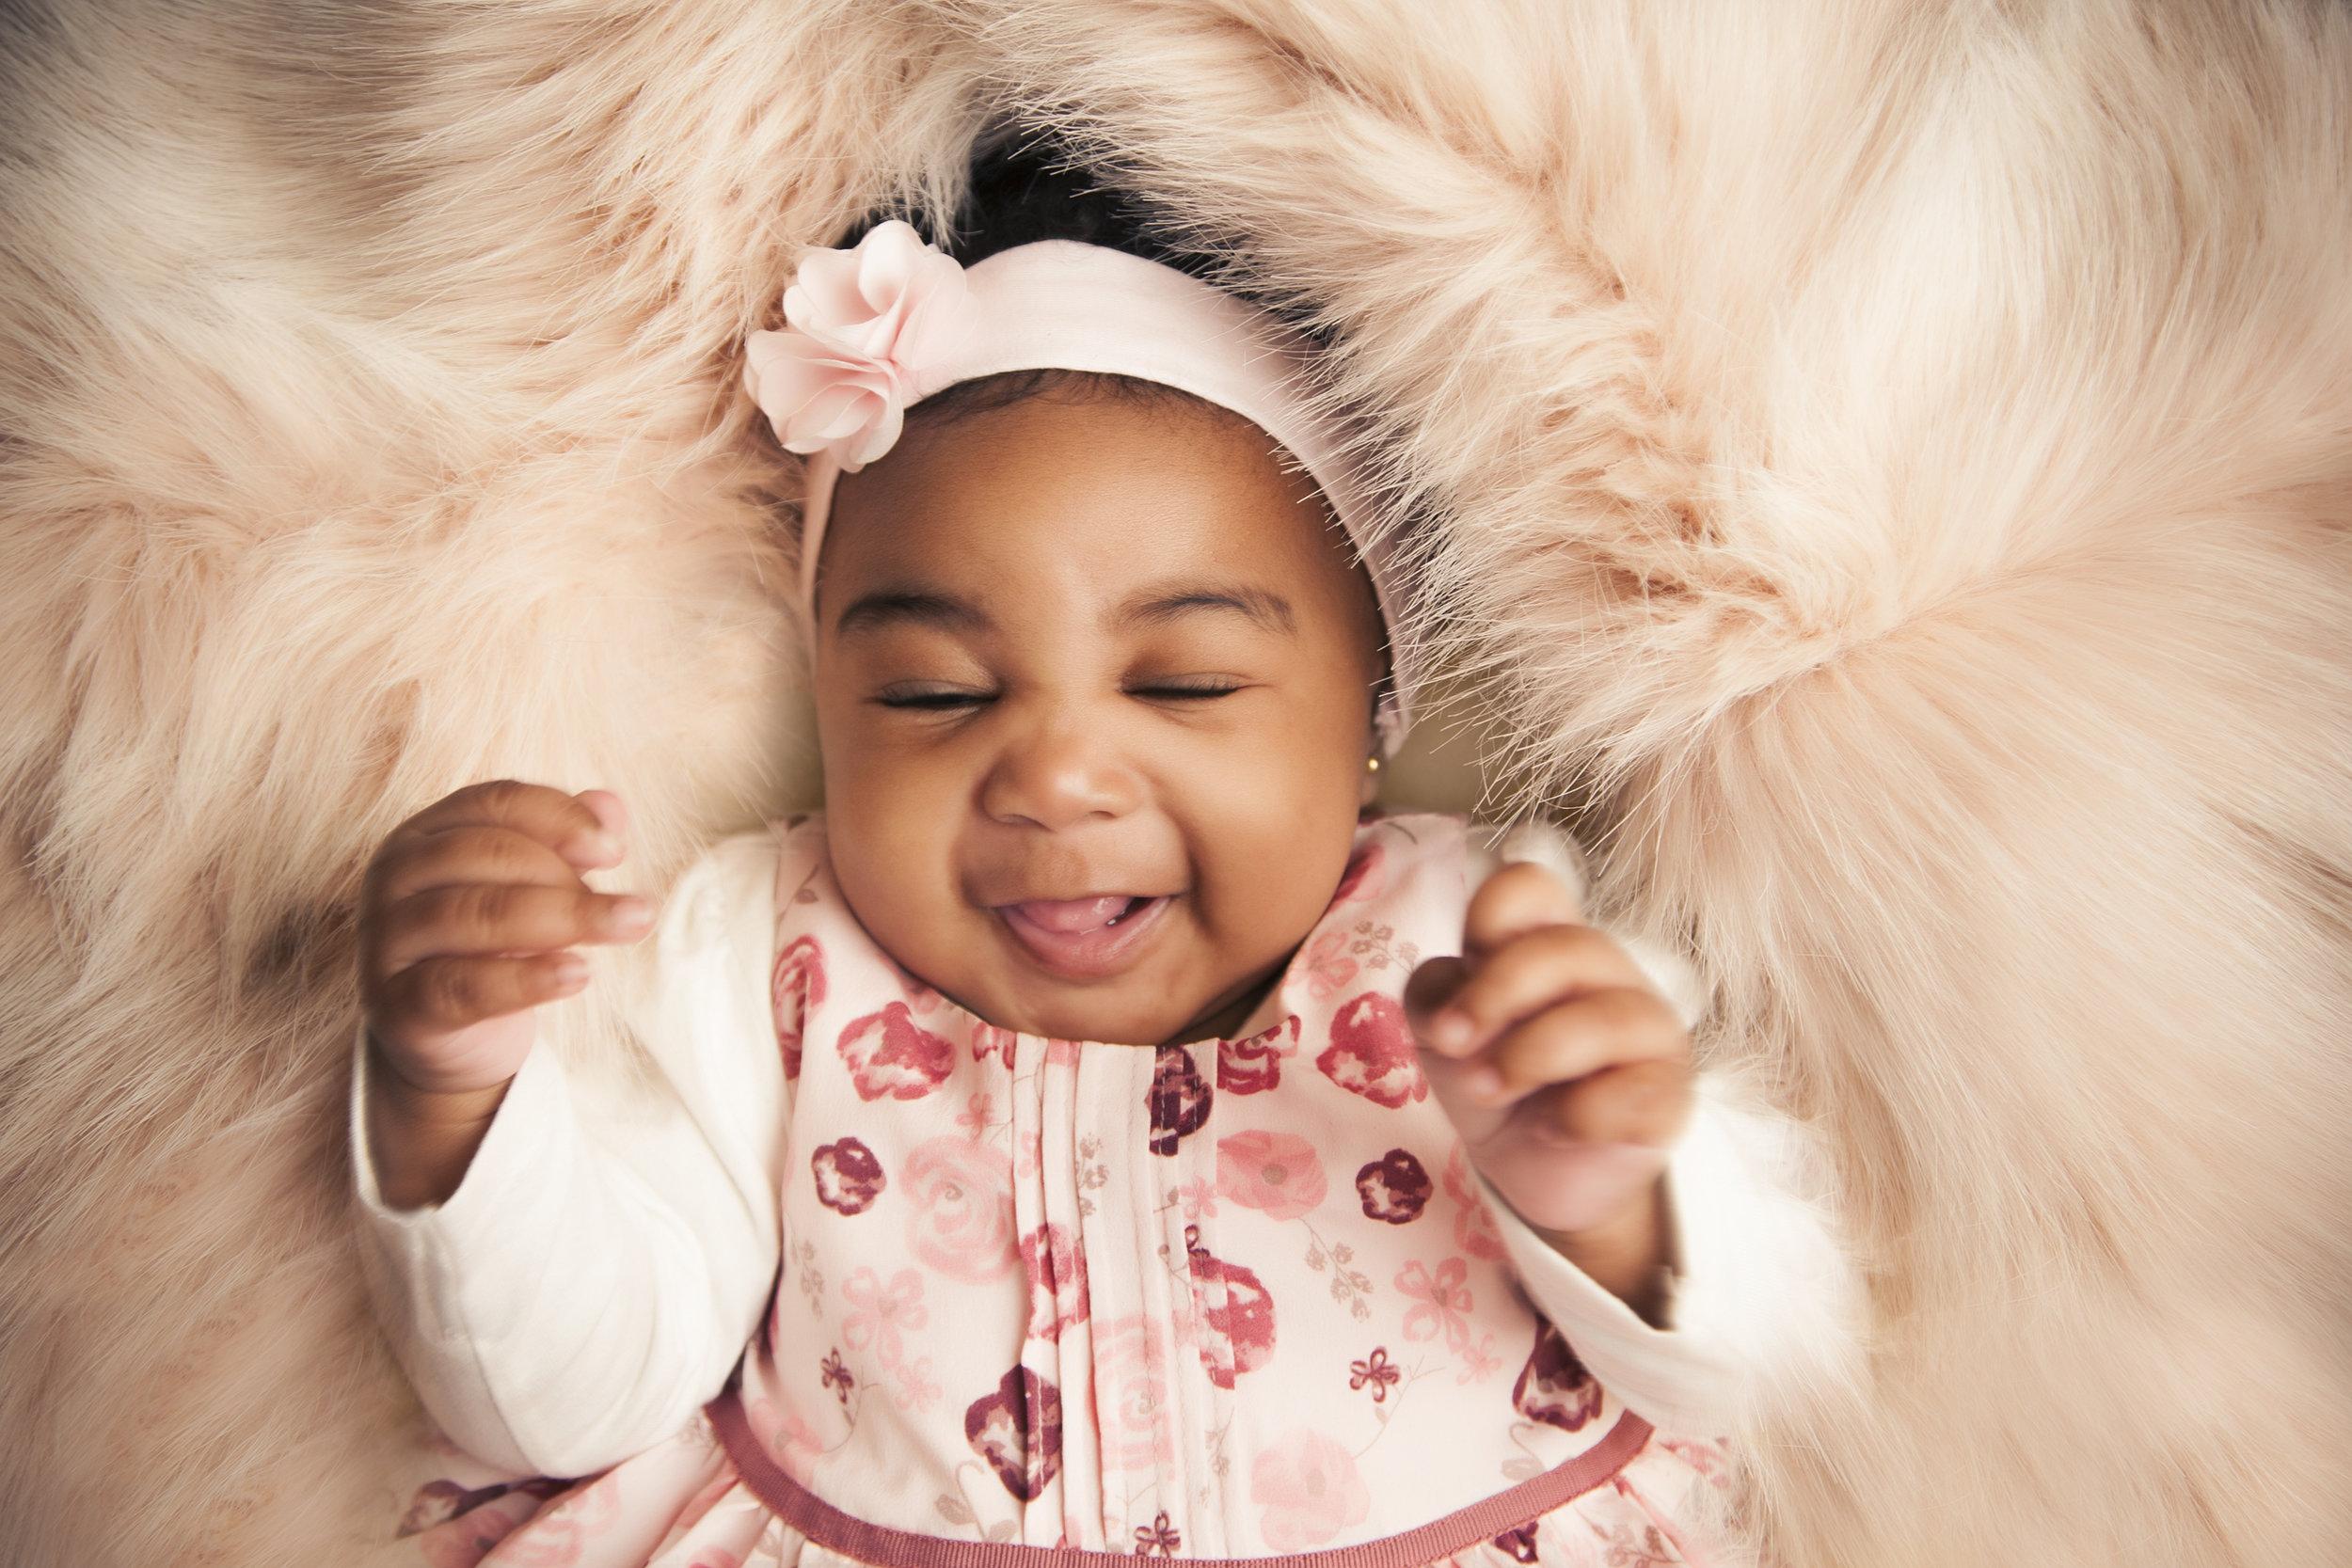 photography-studio-leicester-photo-shoot-photographer-baby-newborn-zigzag-zig-zag-family-clarendon-park-photographer-queens-road-ideas-props-girl-headband-fur-best.jpg